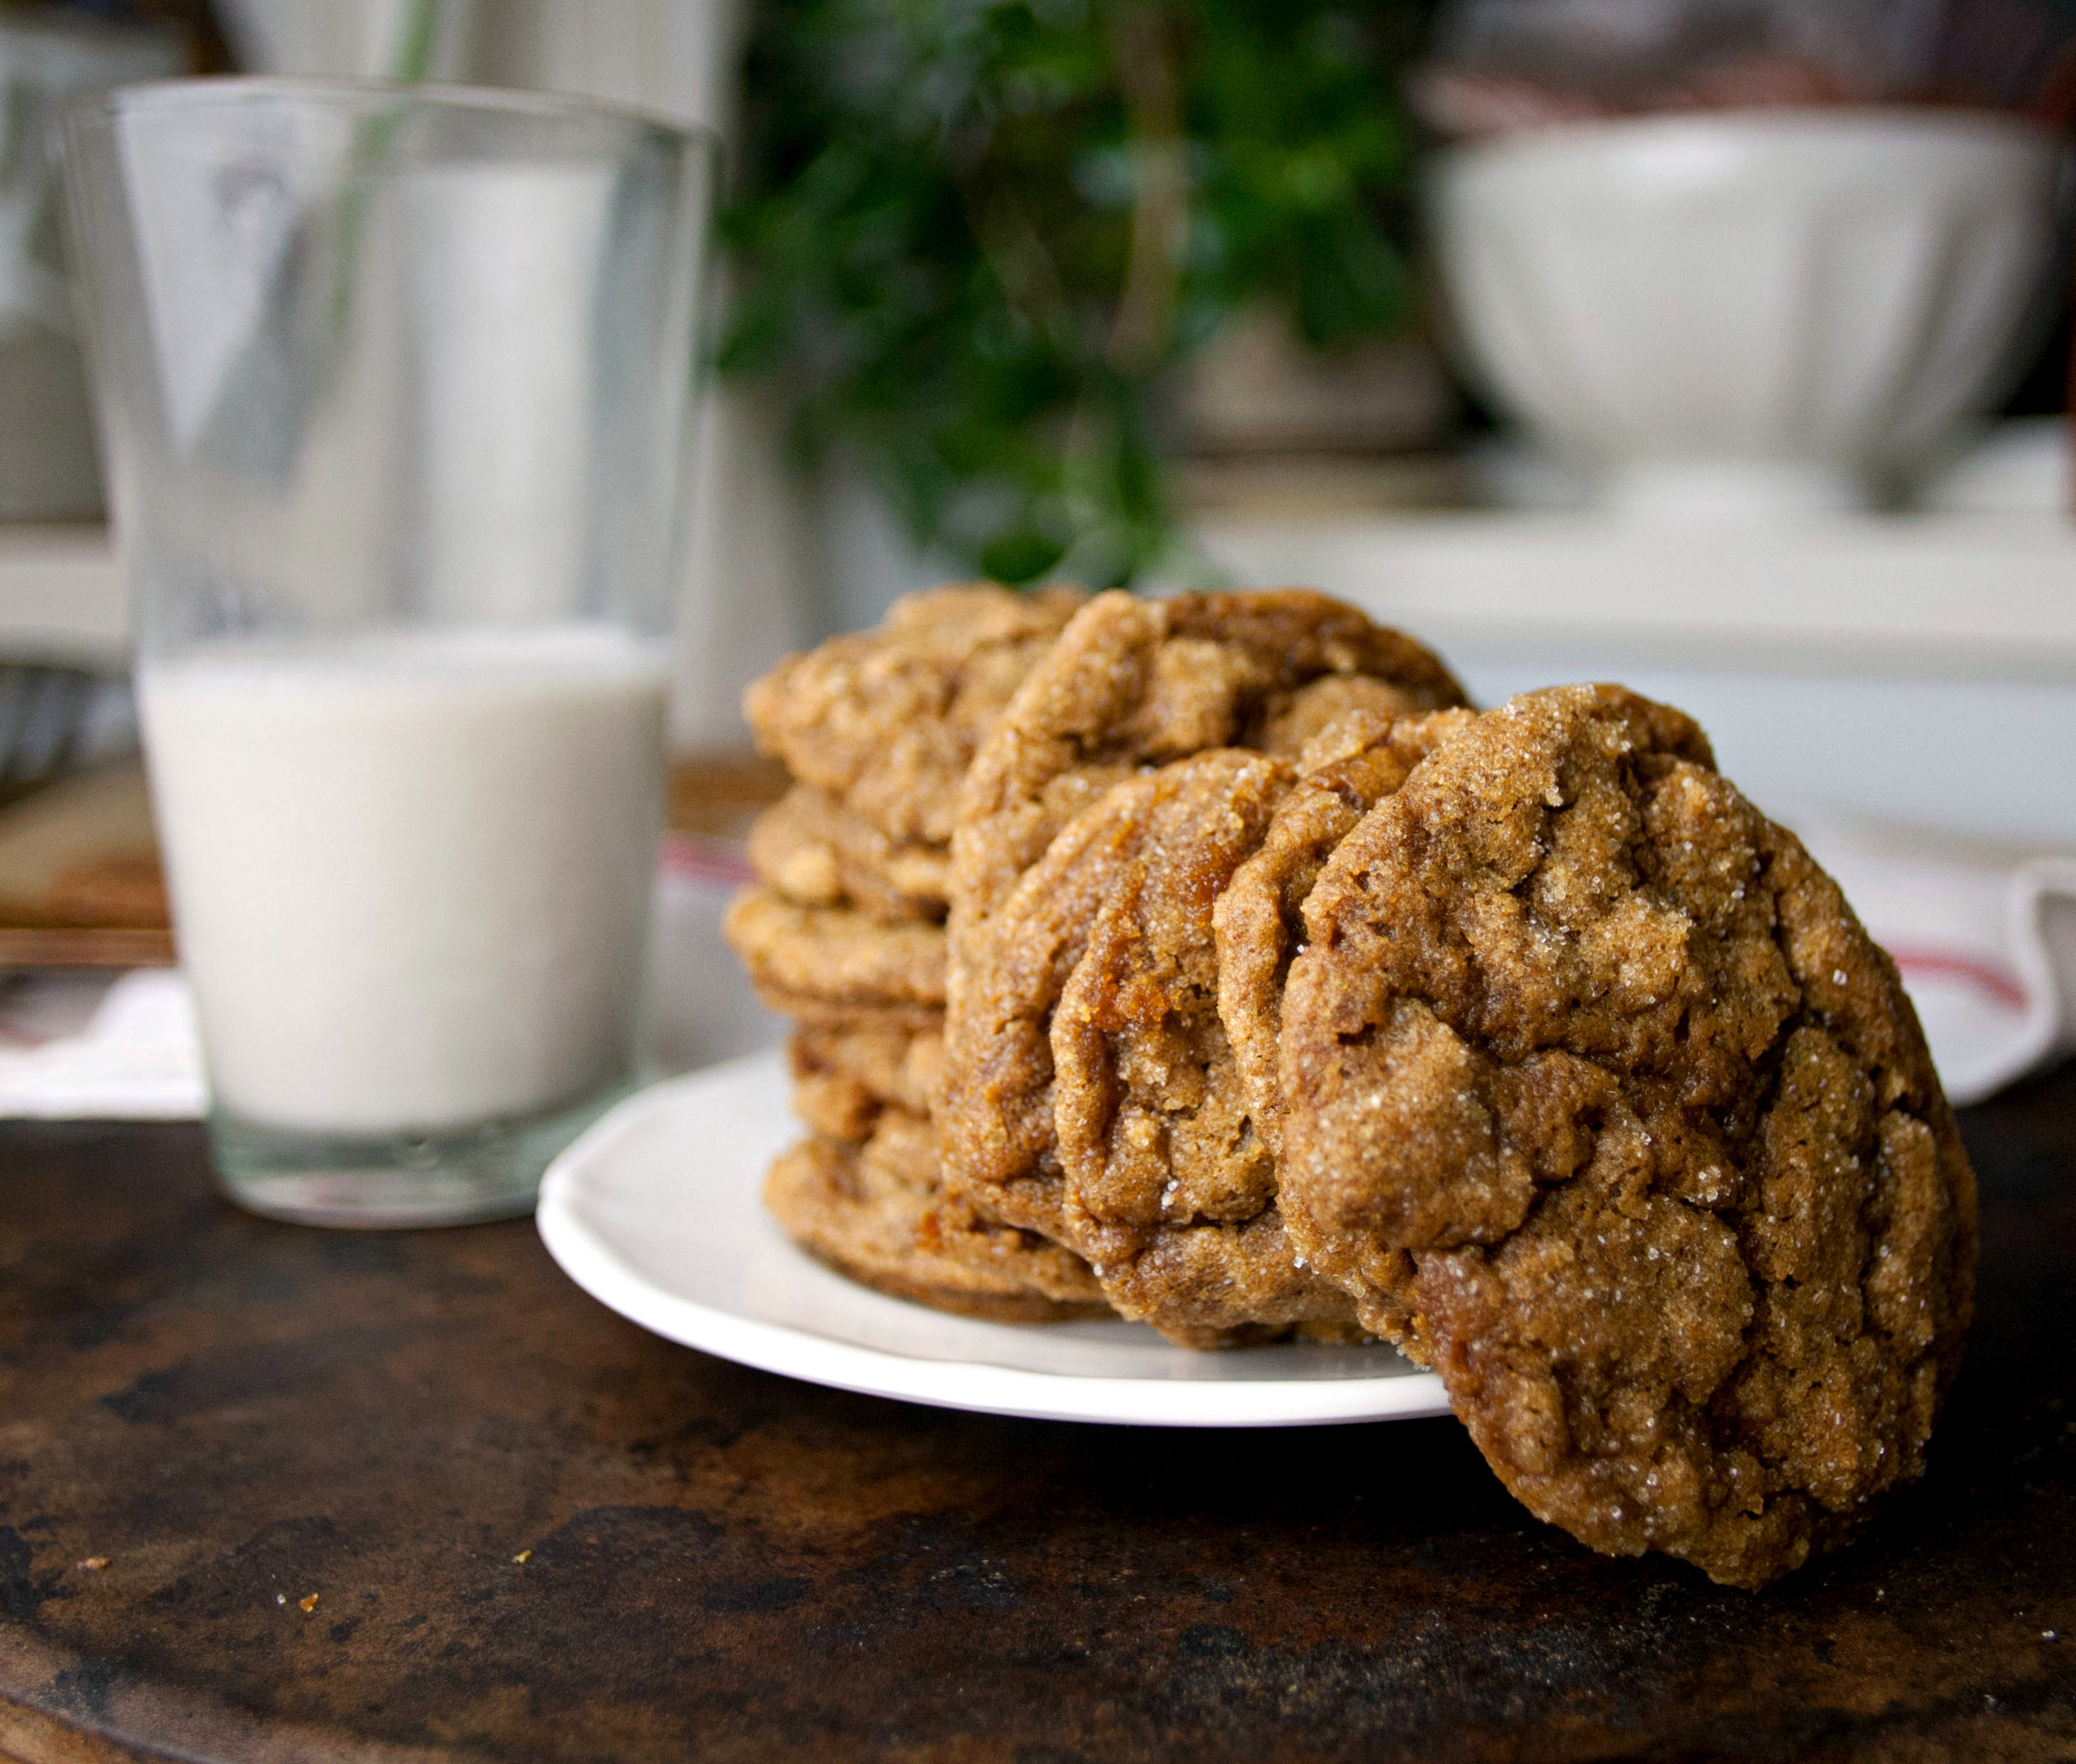 cookietopple